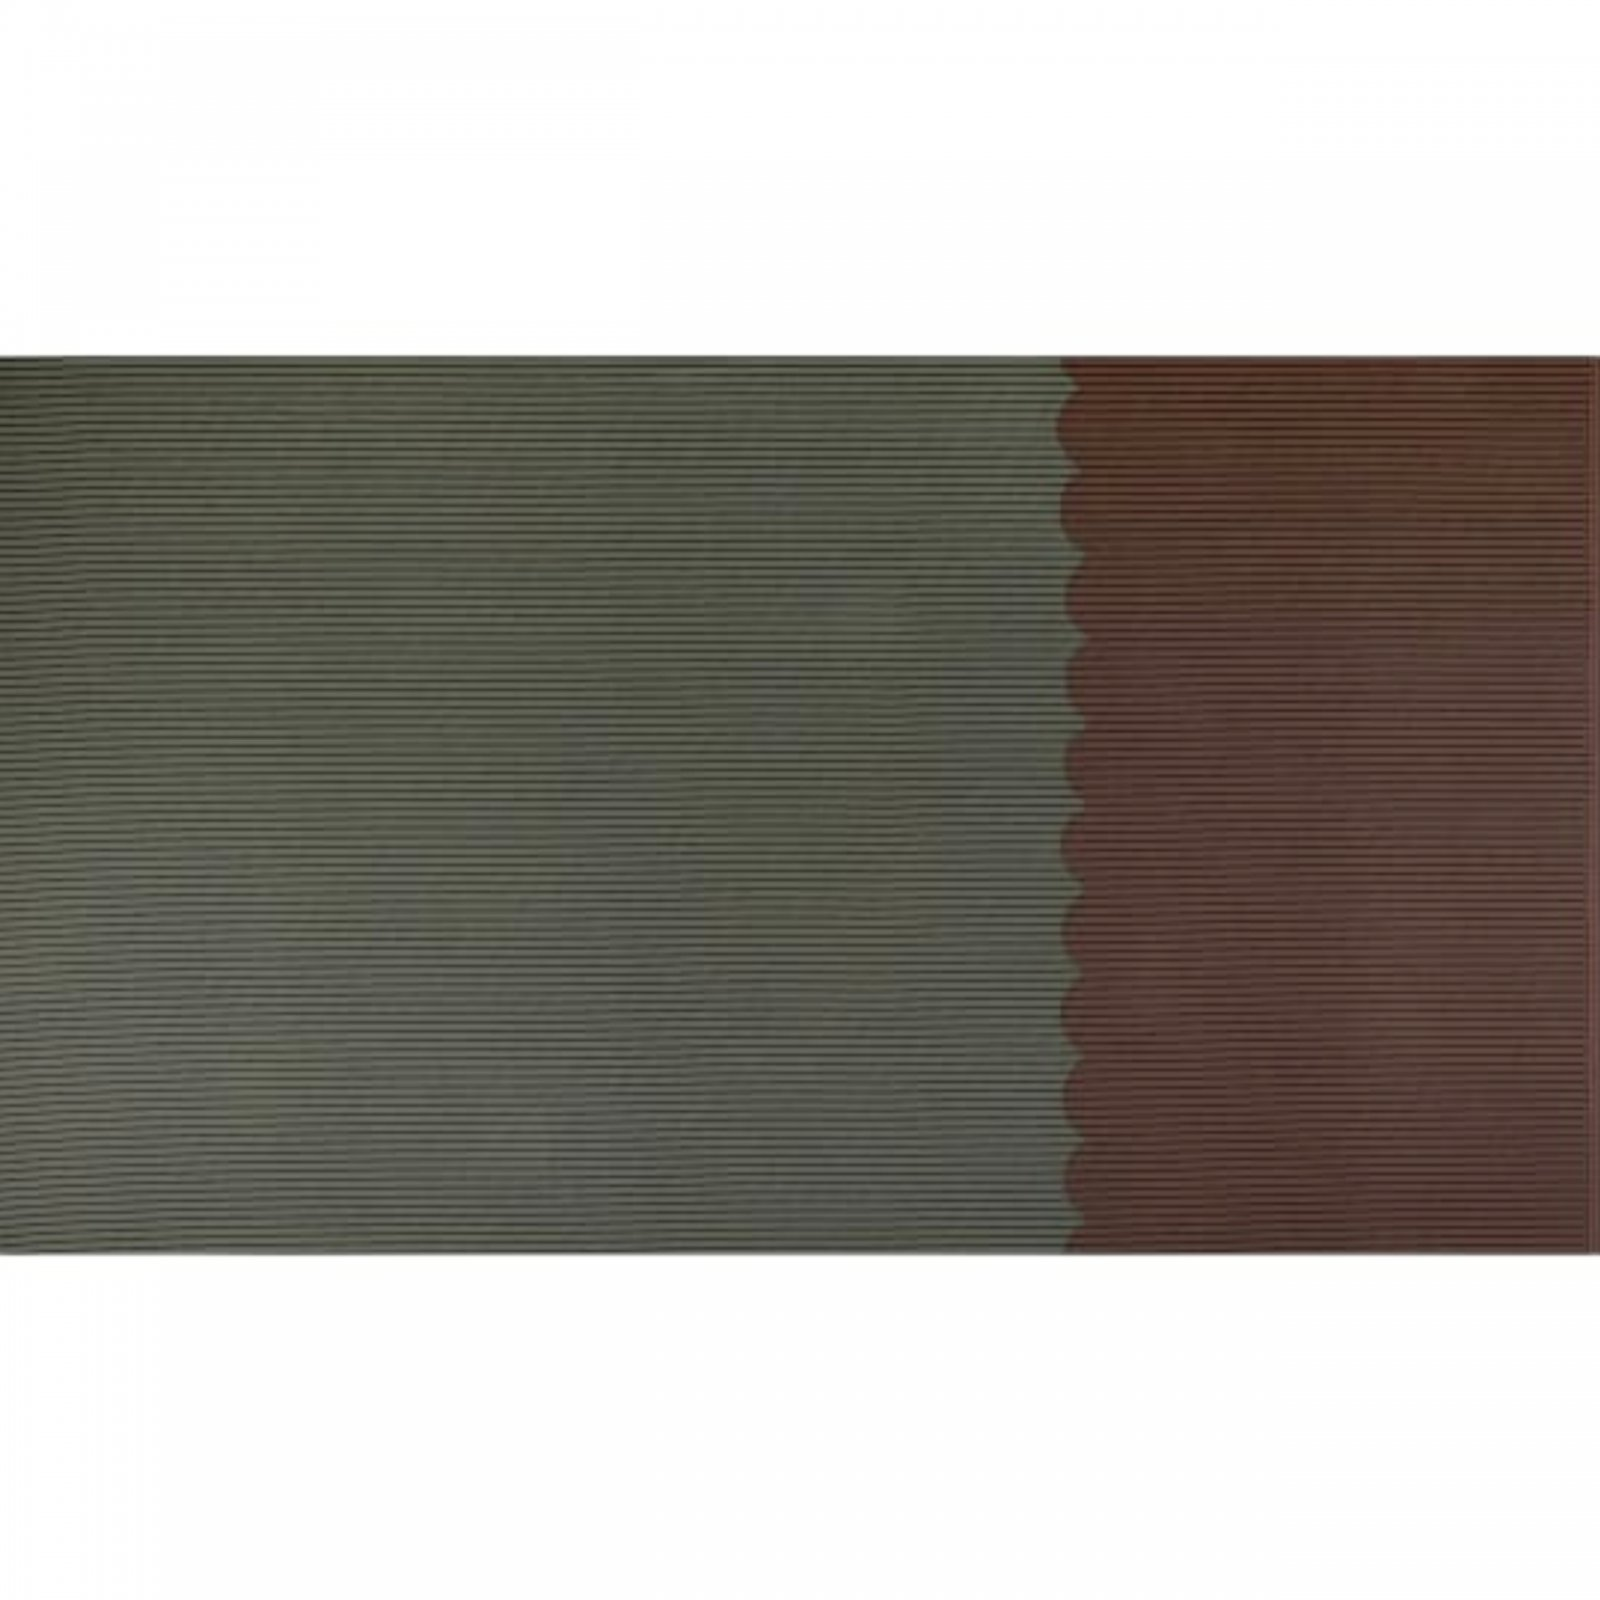 Harriot Stripe Cotton - Zinc